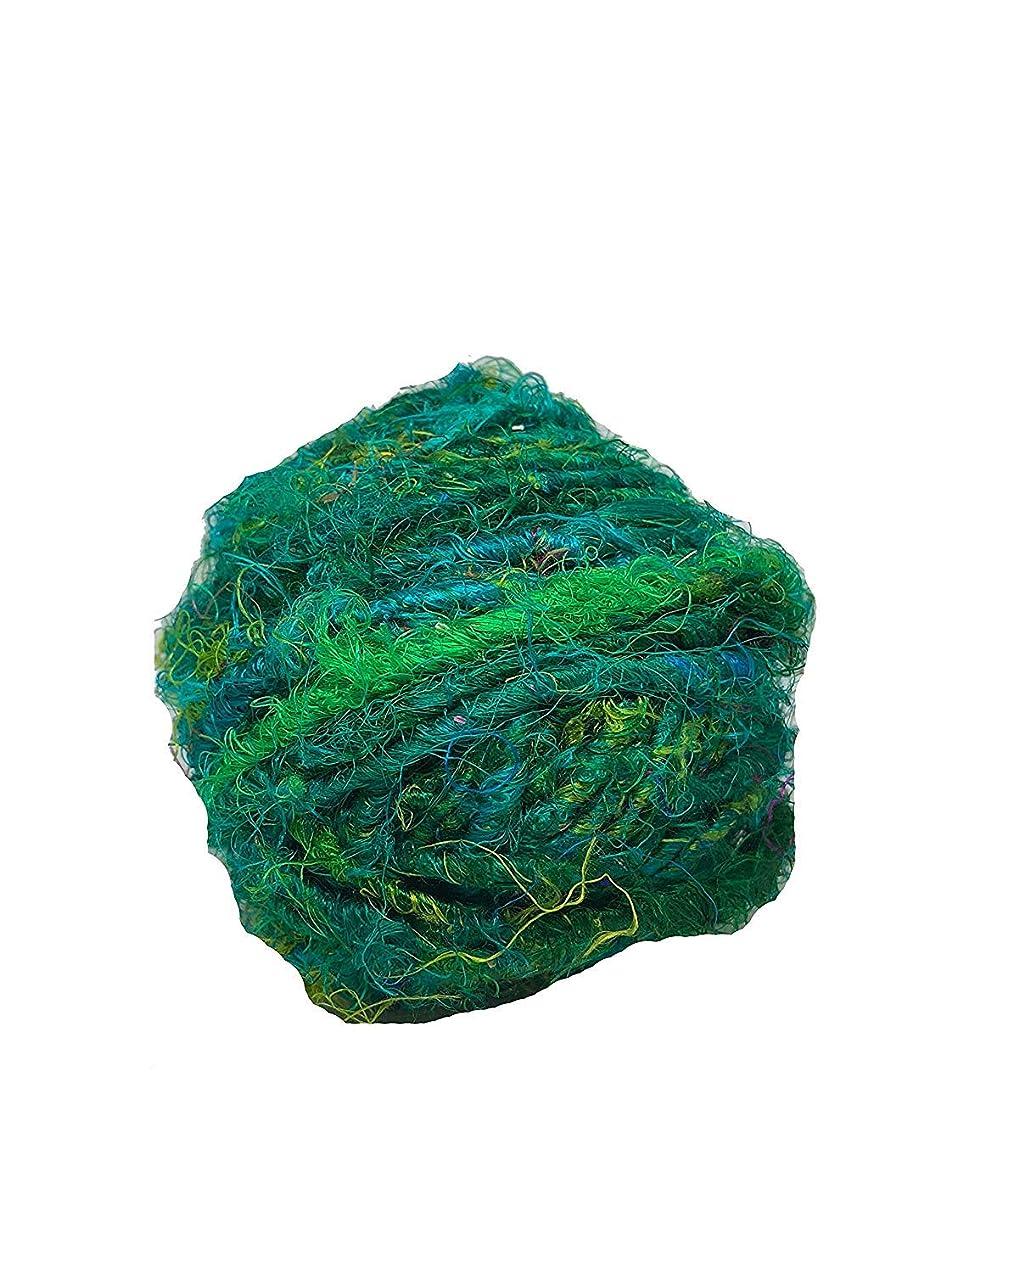 KNITSILK Premium Recycled Sari Silk Yarn - Green - 1 Ball, 90 Yards - Knit, Crochet, jewelery - Ethical Yarn